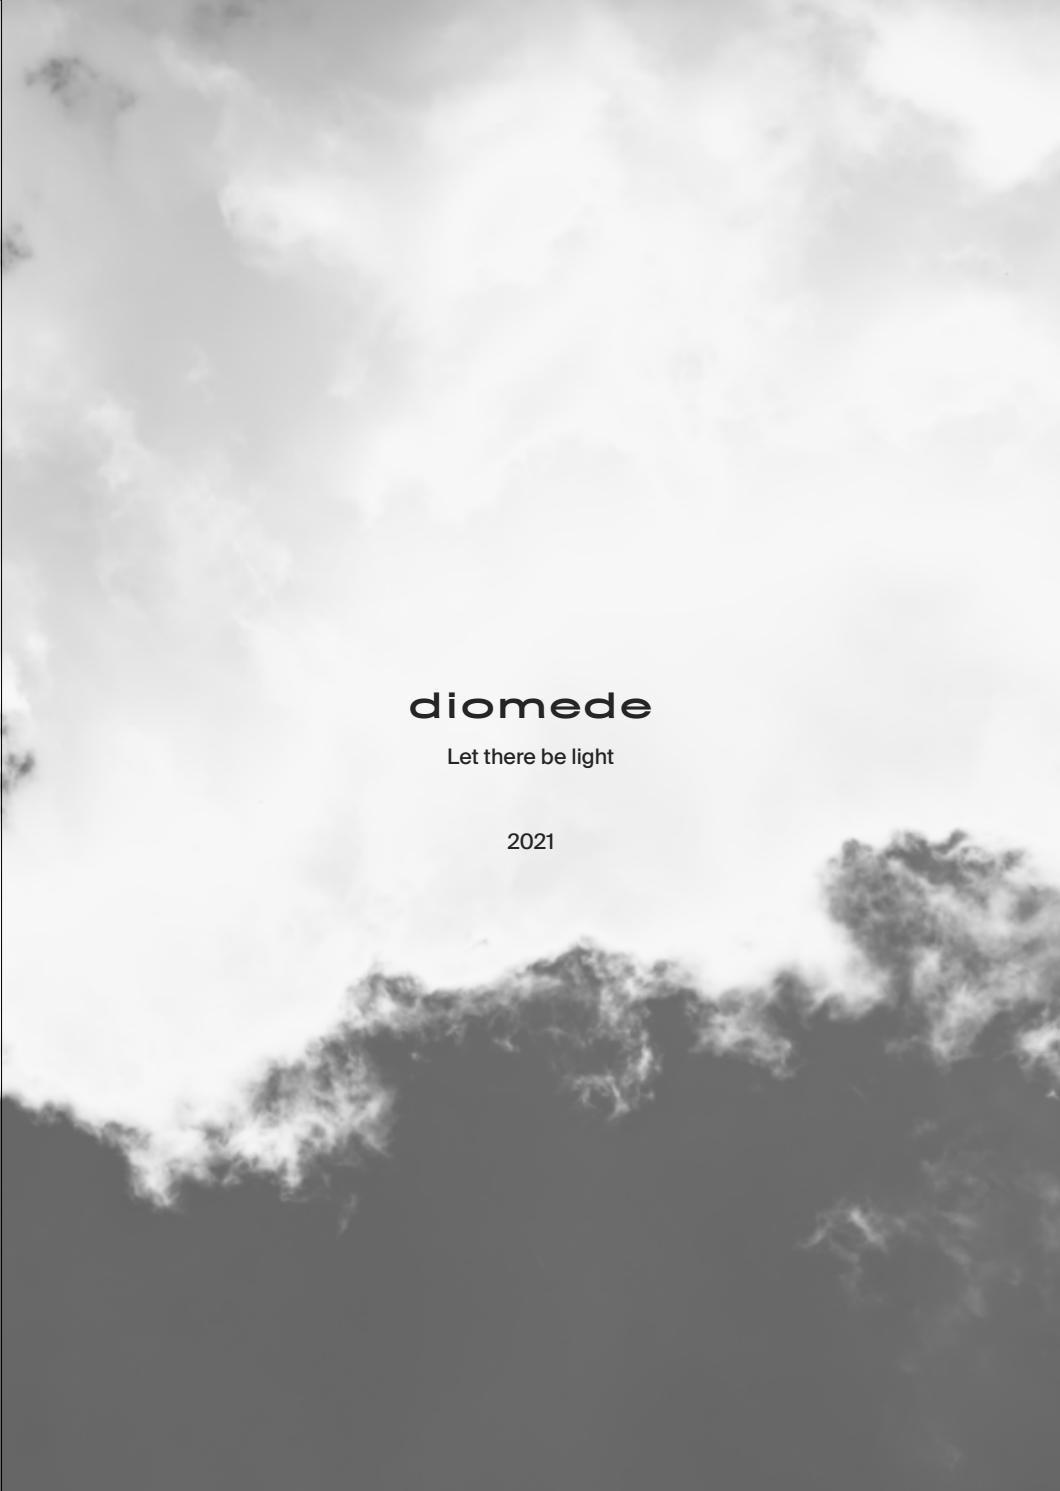 diomede